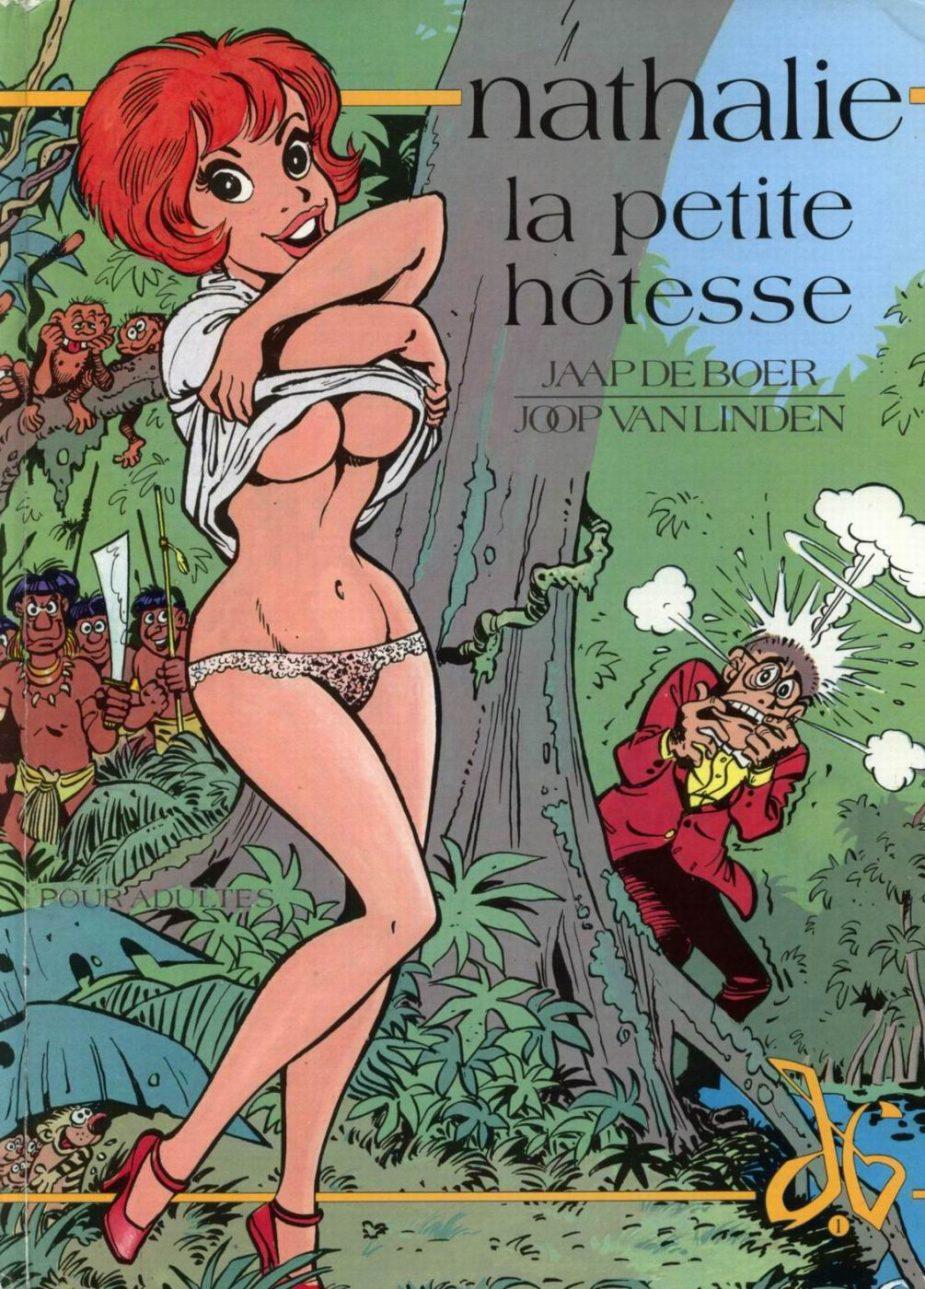 Jaap De Boer Nathalie Petite Hotesse Couv